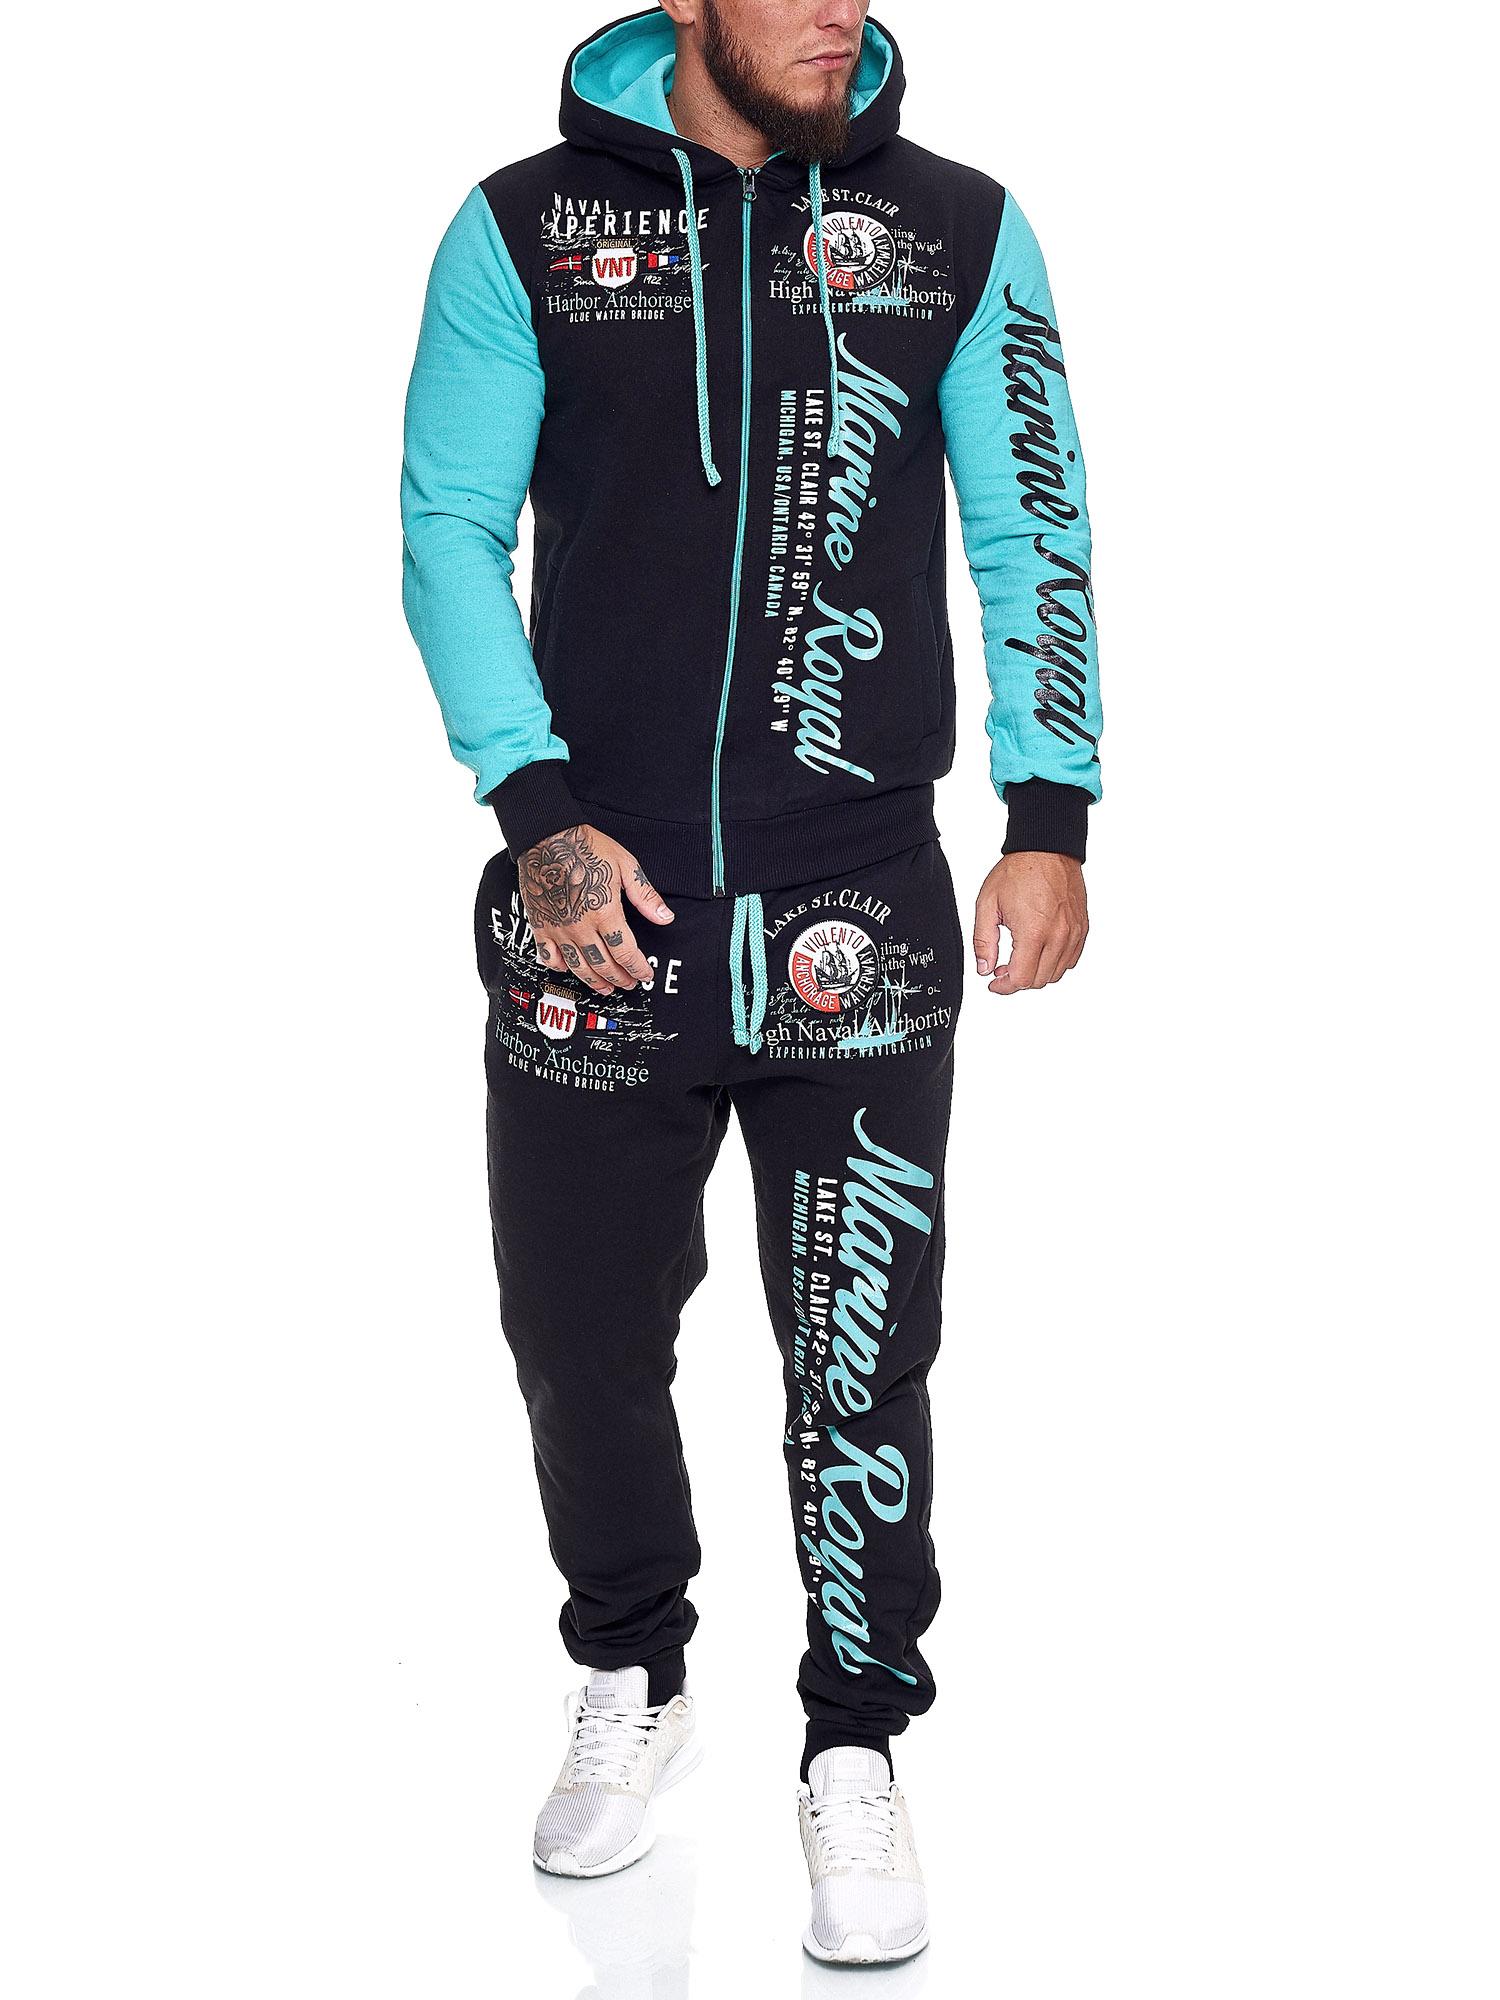 Damen-Jogginganzug-Frauen-Trainingsanzug-Sportanzug-Streetwear-JG-512-John-Kayna Indexbild 41